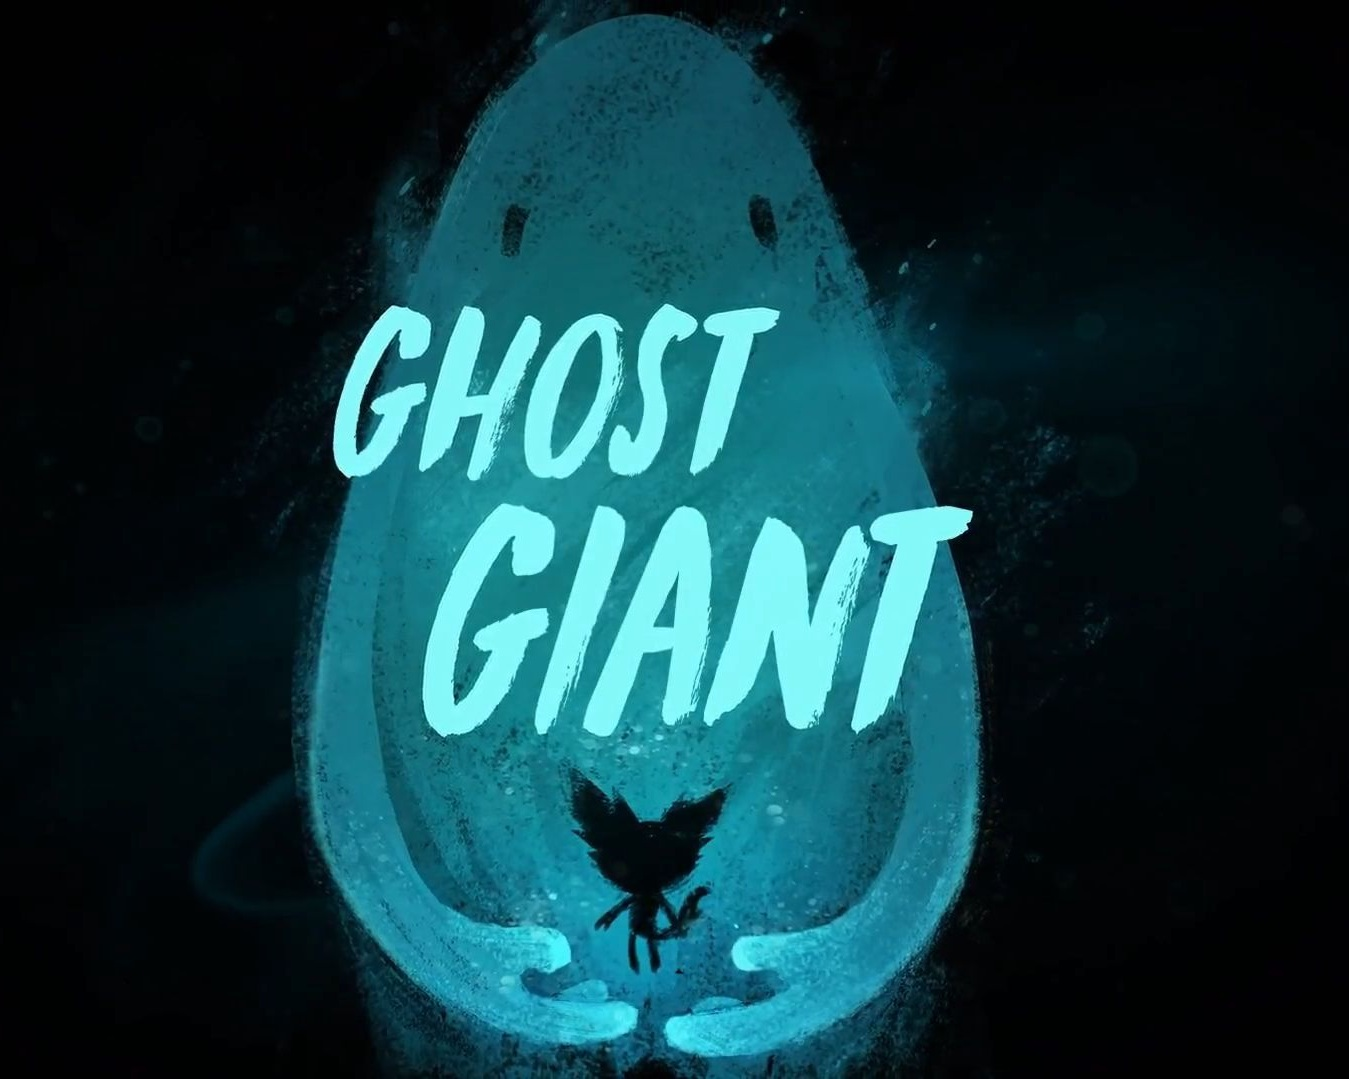 ghostgiant.jpg